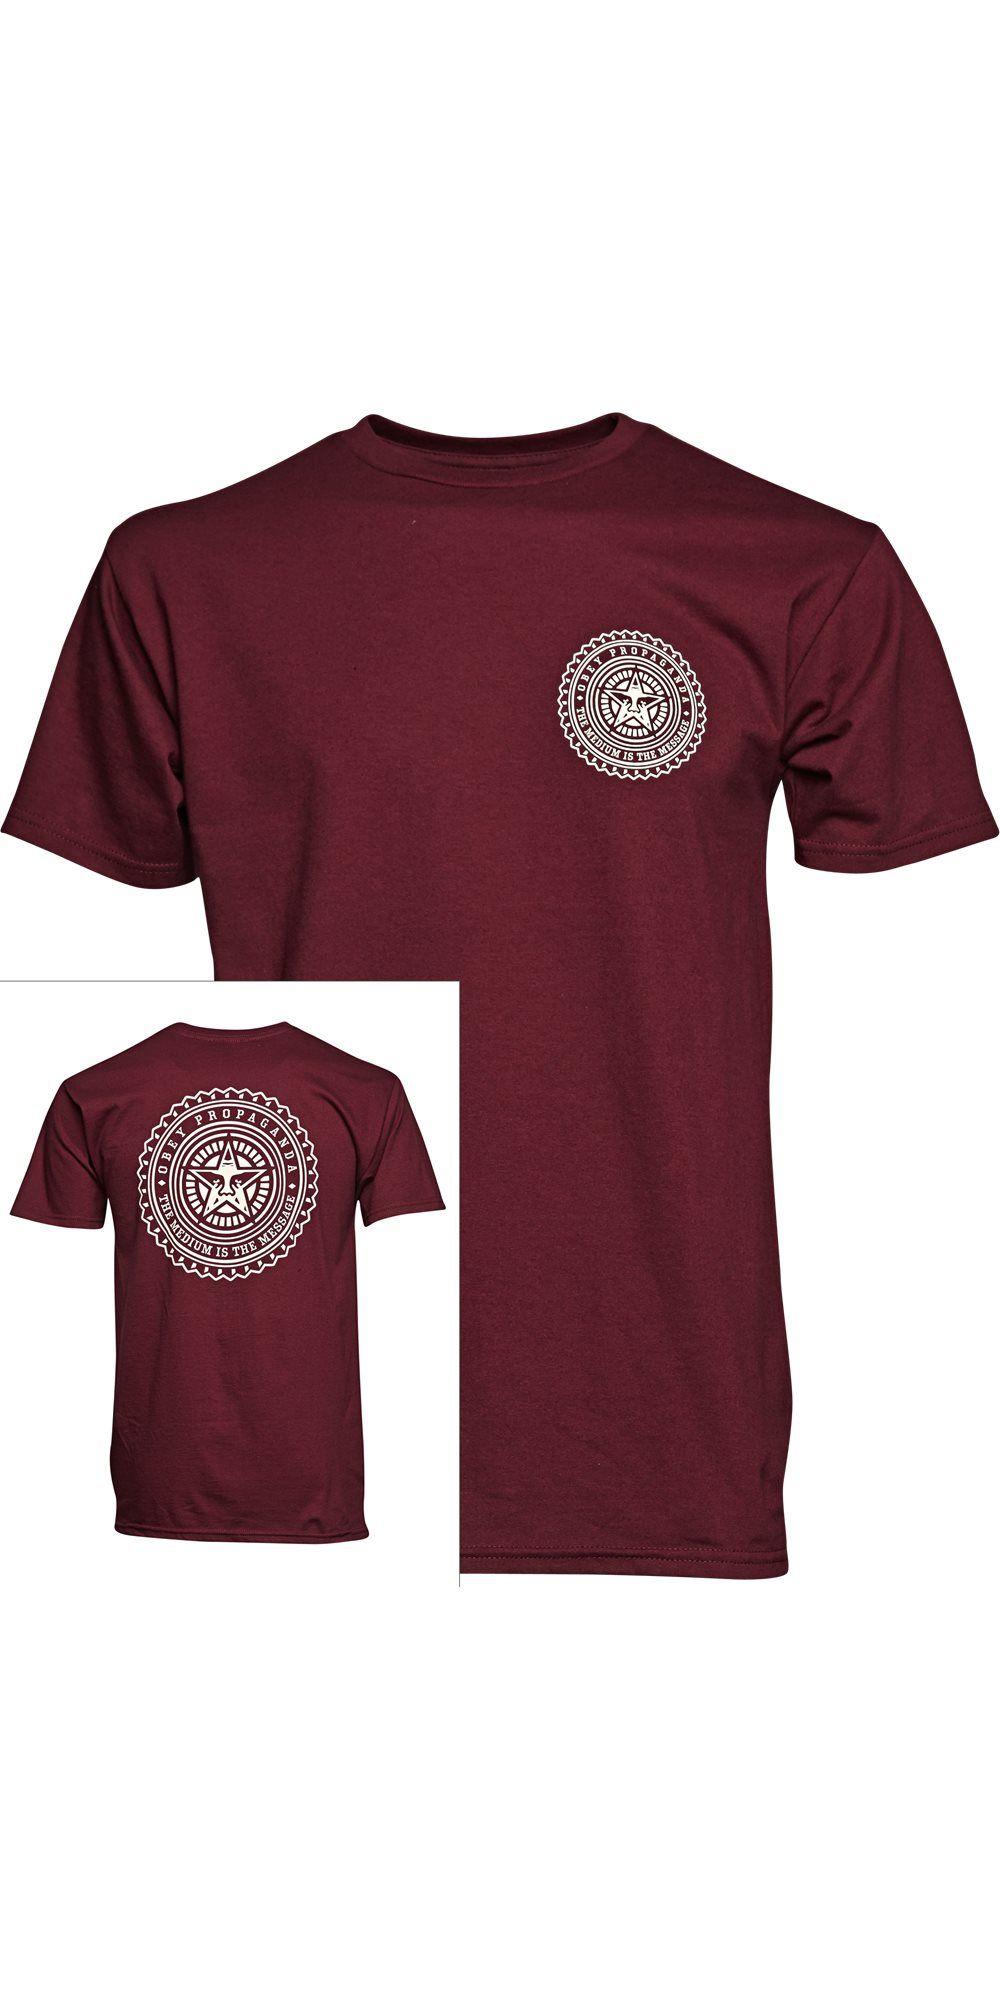 The Medium 163080559 T Shirts Bordeaux Fra Obey Dkk 300 L Street Wear T Shirt Shirts